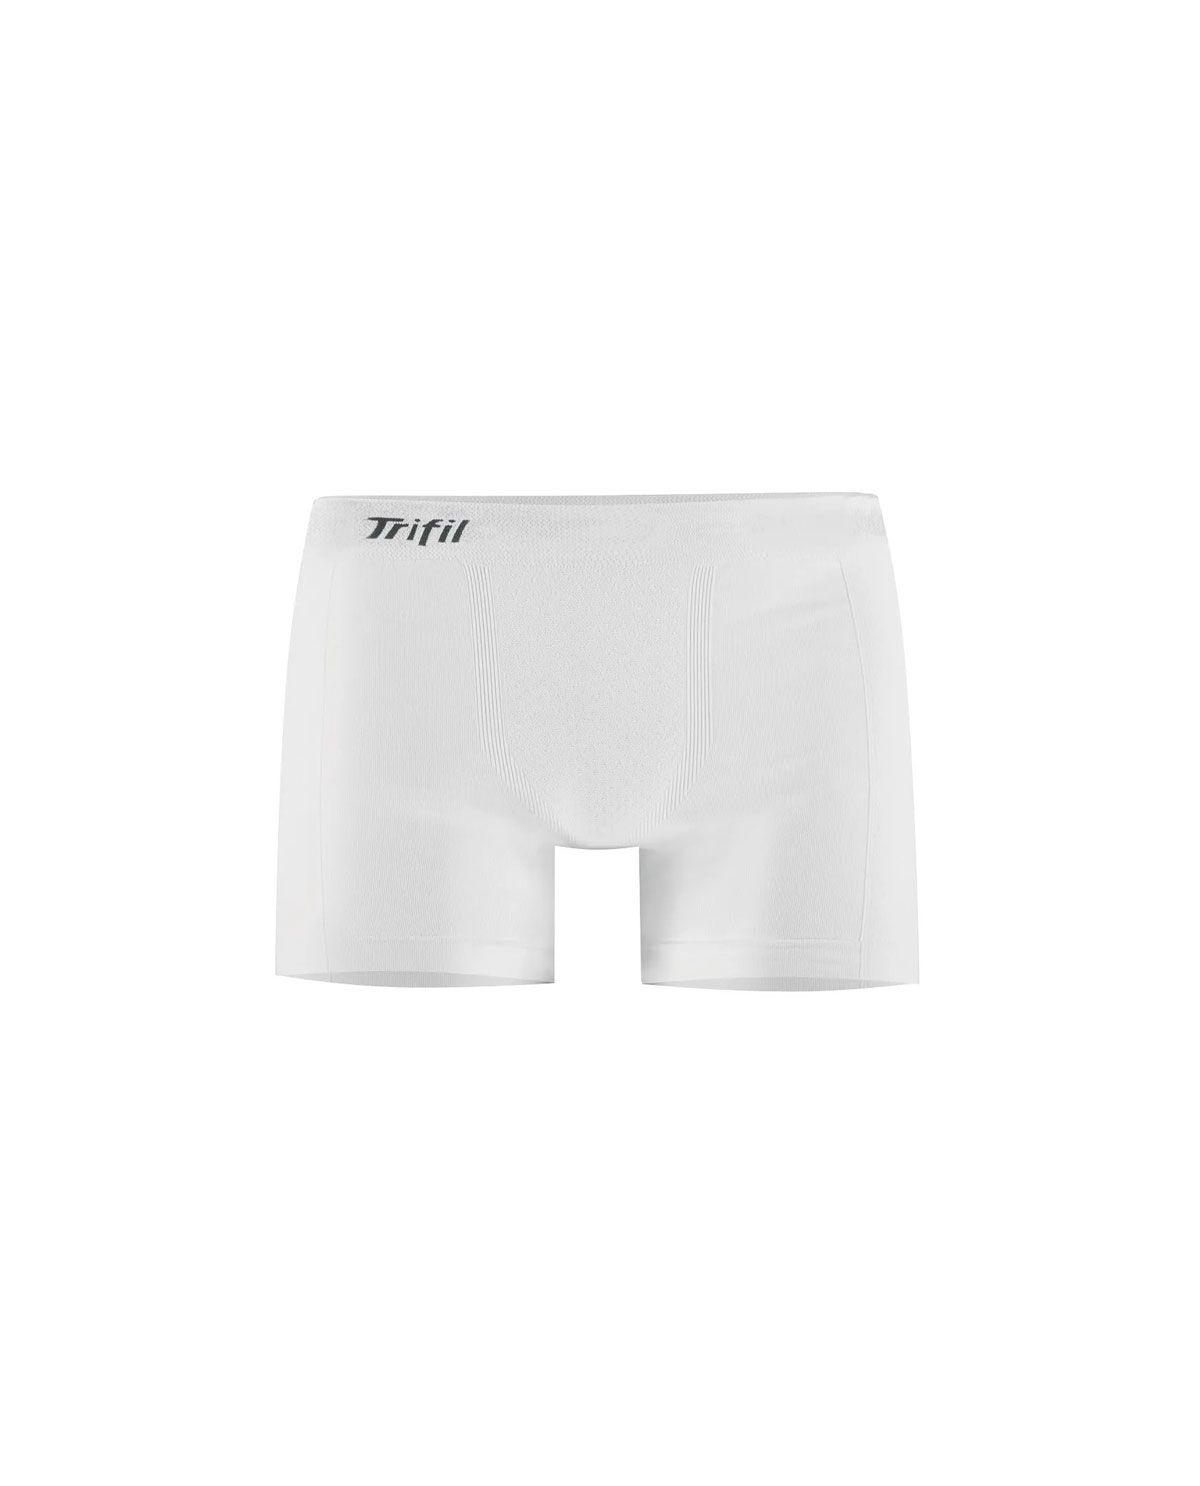 Cueca Boxer Plus Size - Trifil 4411